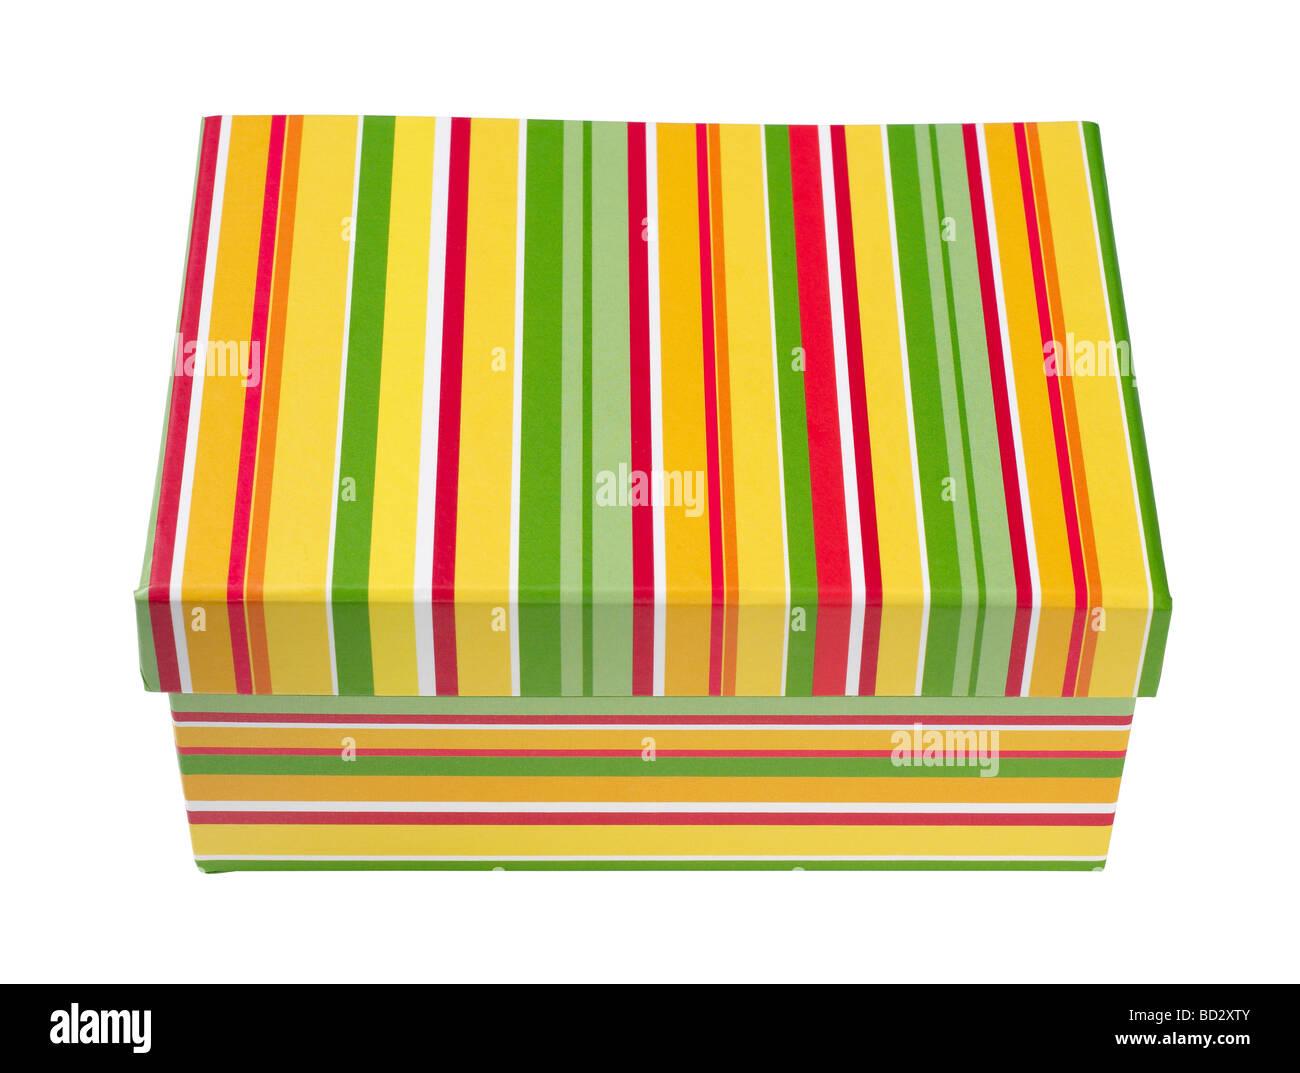 Gift Present Box - Stock Image